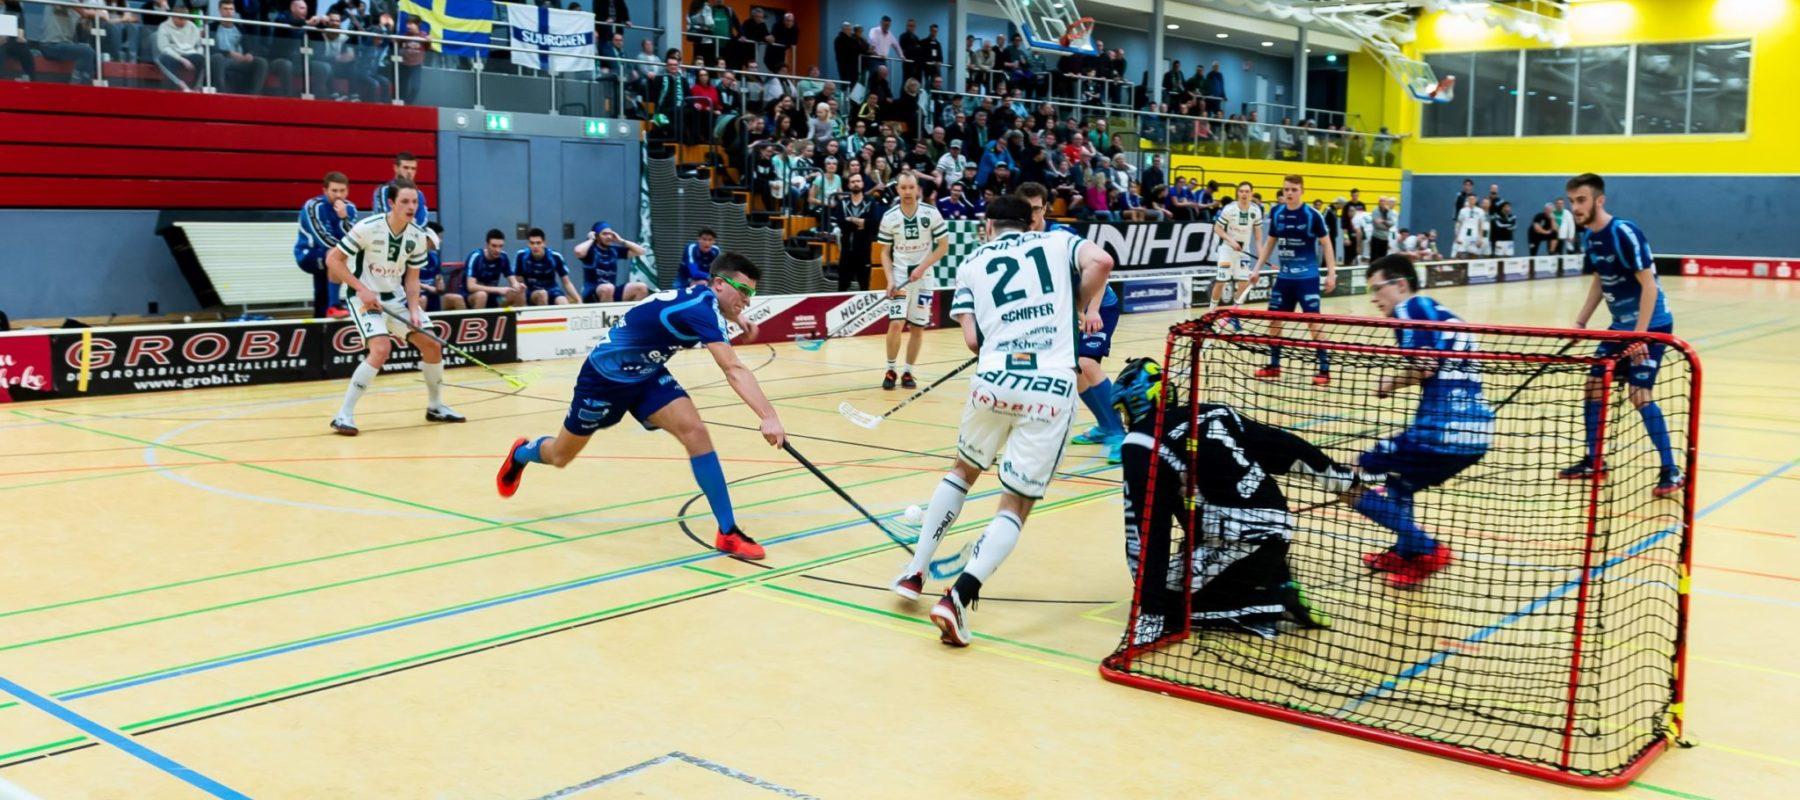 Intensives Spiel vor toller Kulisse - DJK gg. Chemnitz (Foto: Andreas Klüppelberg)